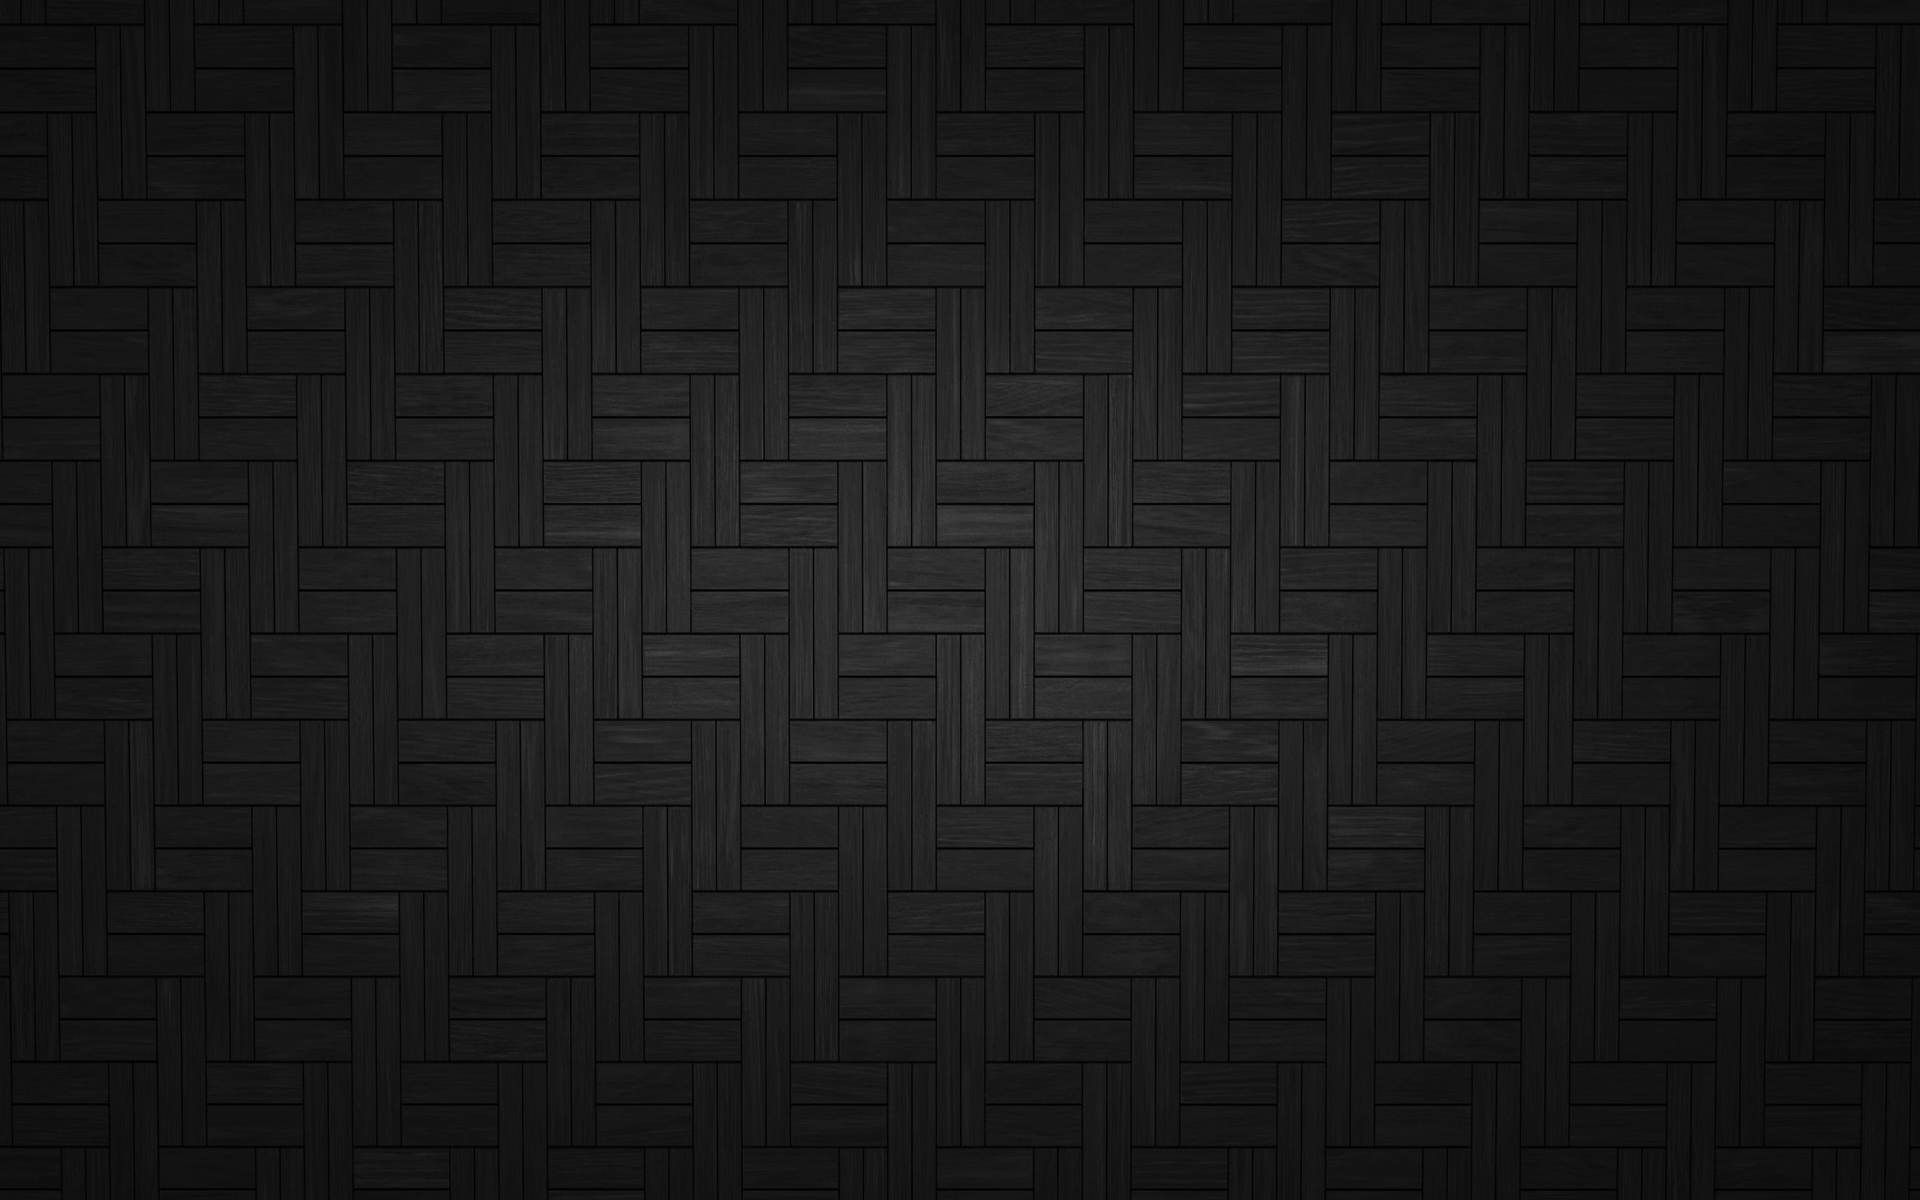 Black Wallpaper · · Free Stock Photos